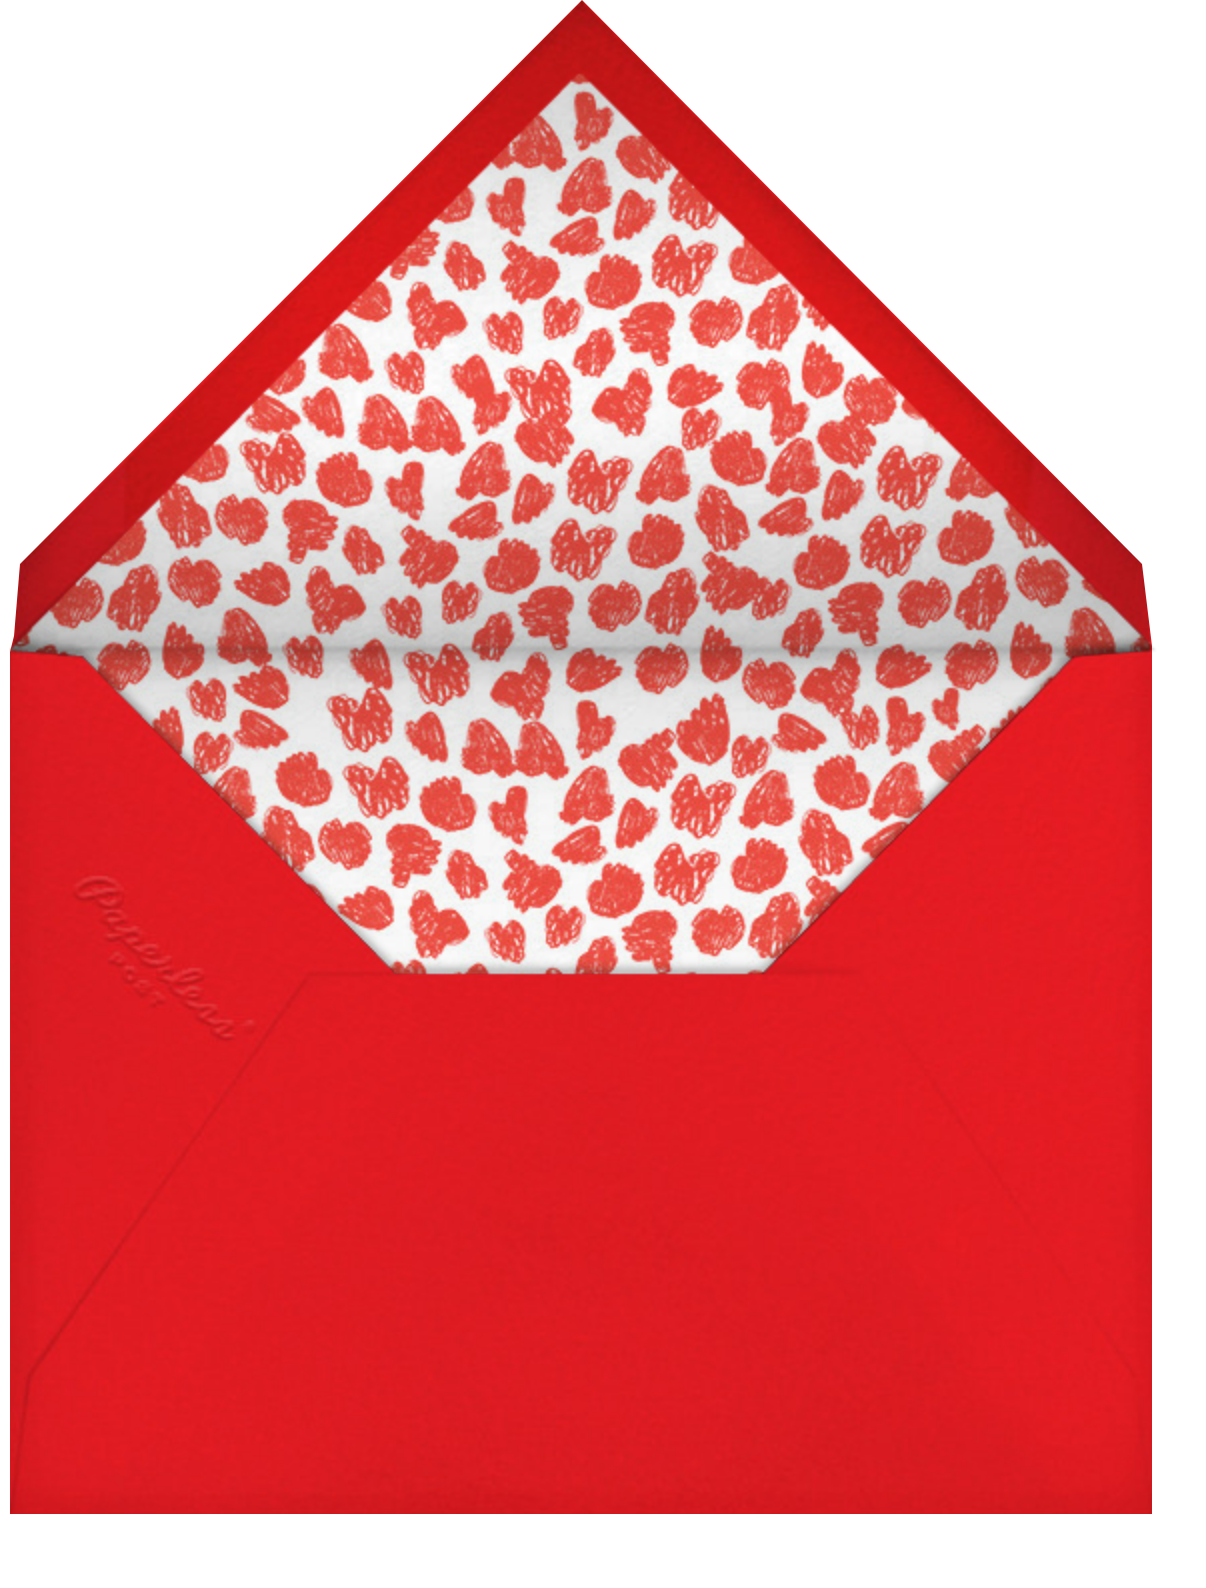 All the Ways - Mr. Boddington's Studio - Valentine's Day - envelope back